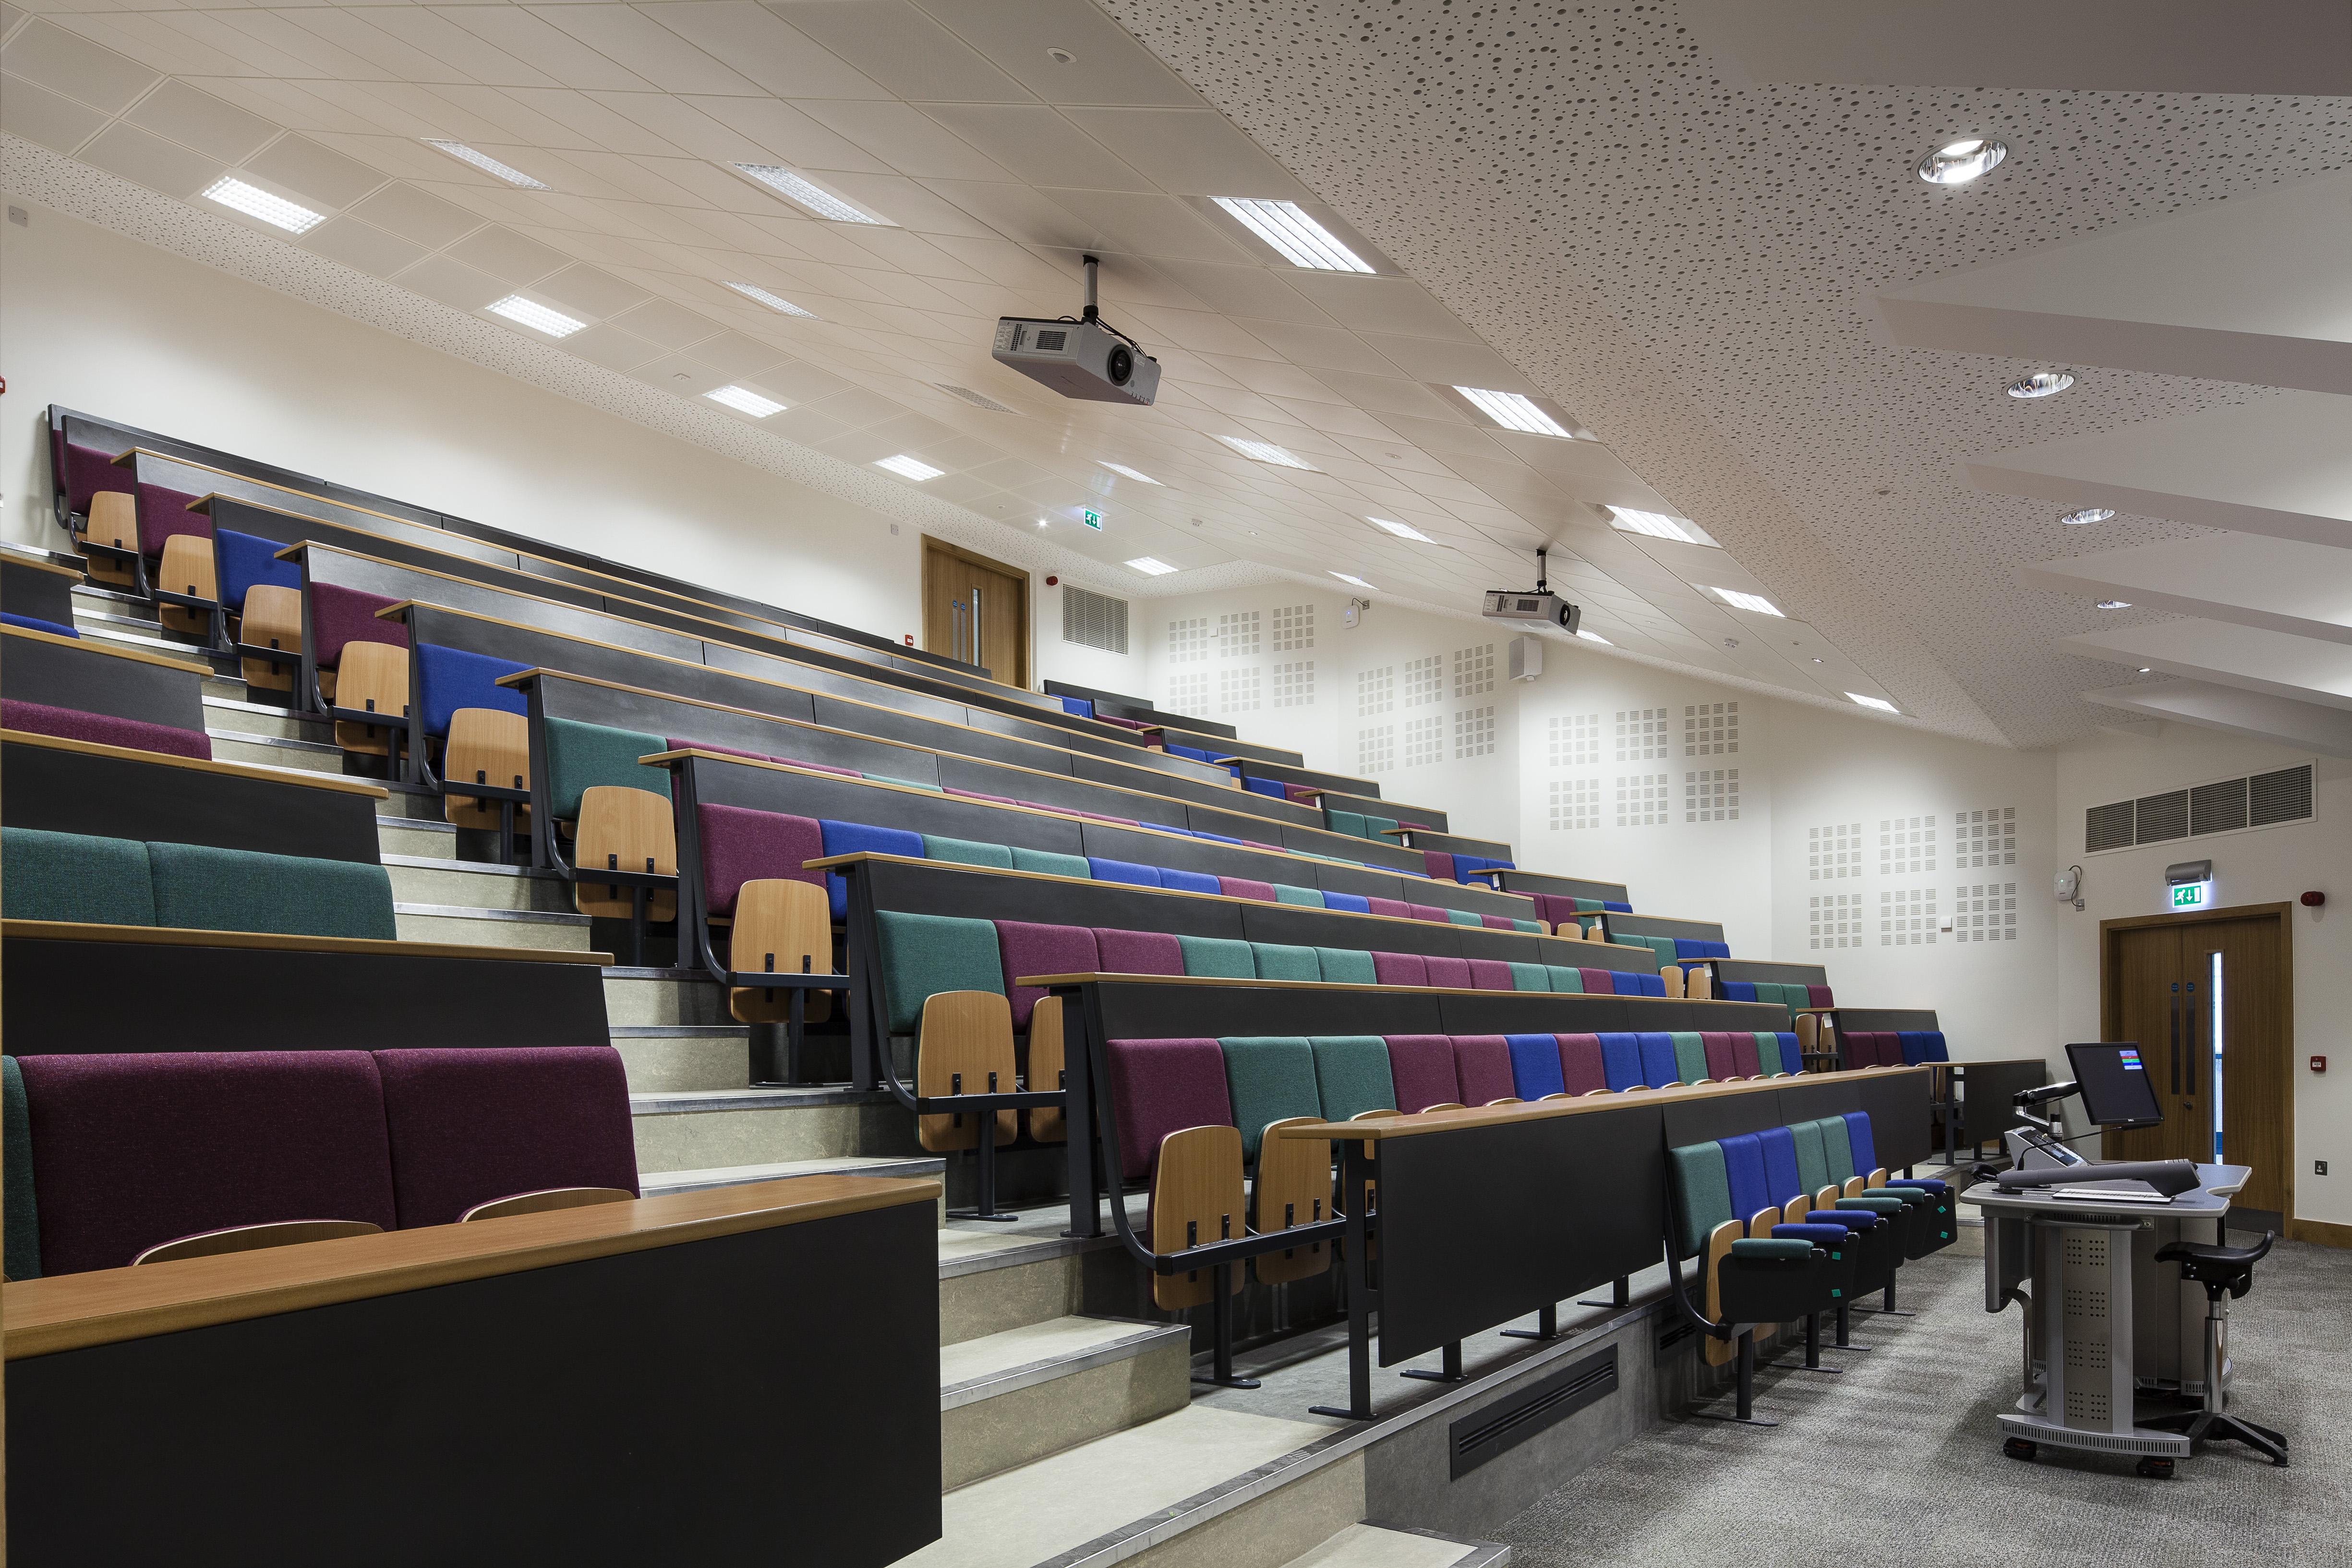 university college dublin science block gyproc. Black Bedroom Furniture Sets. Home Design Ideas